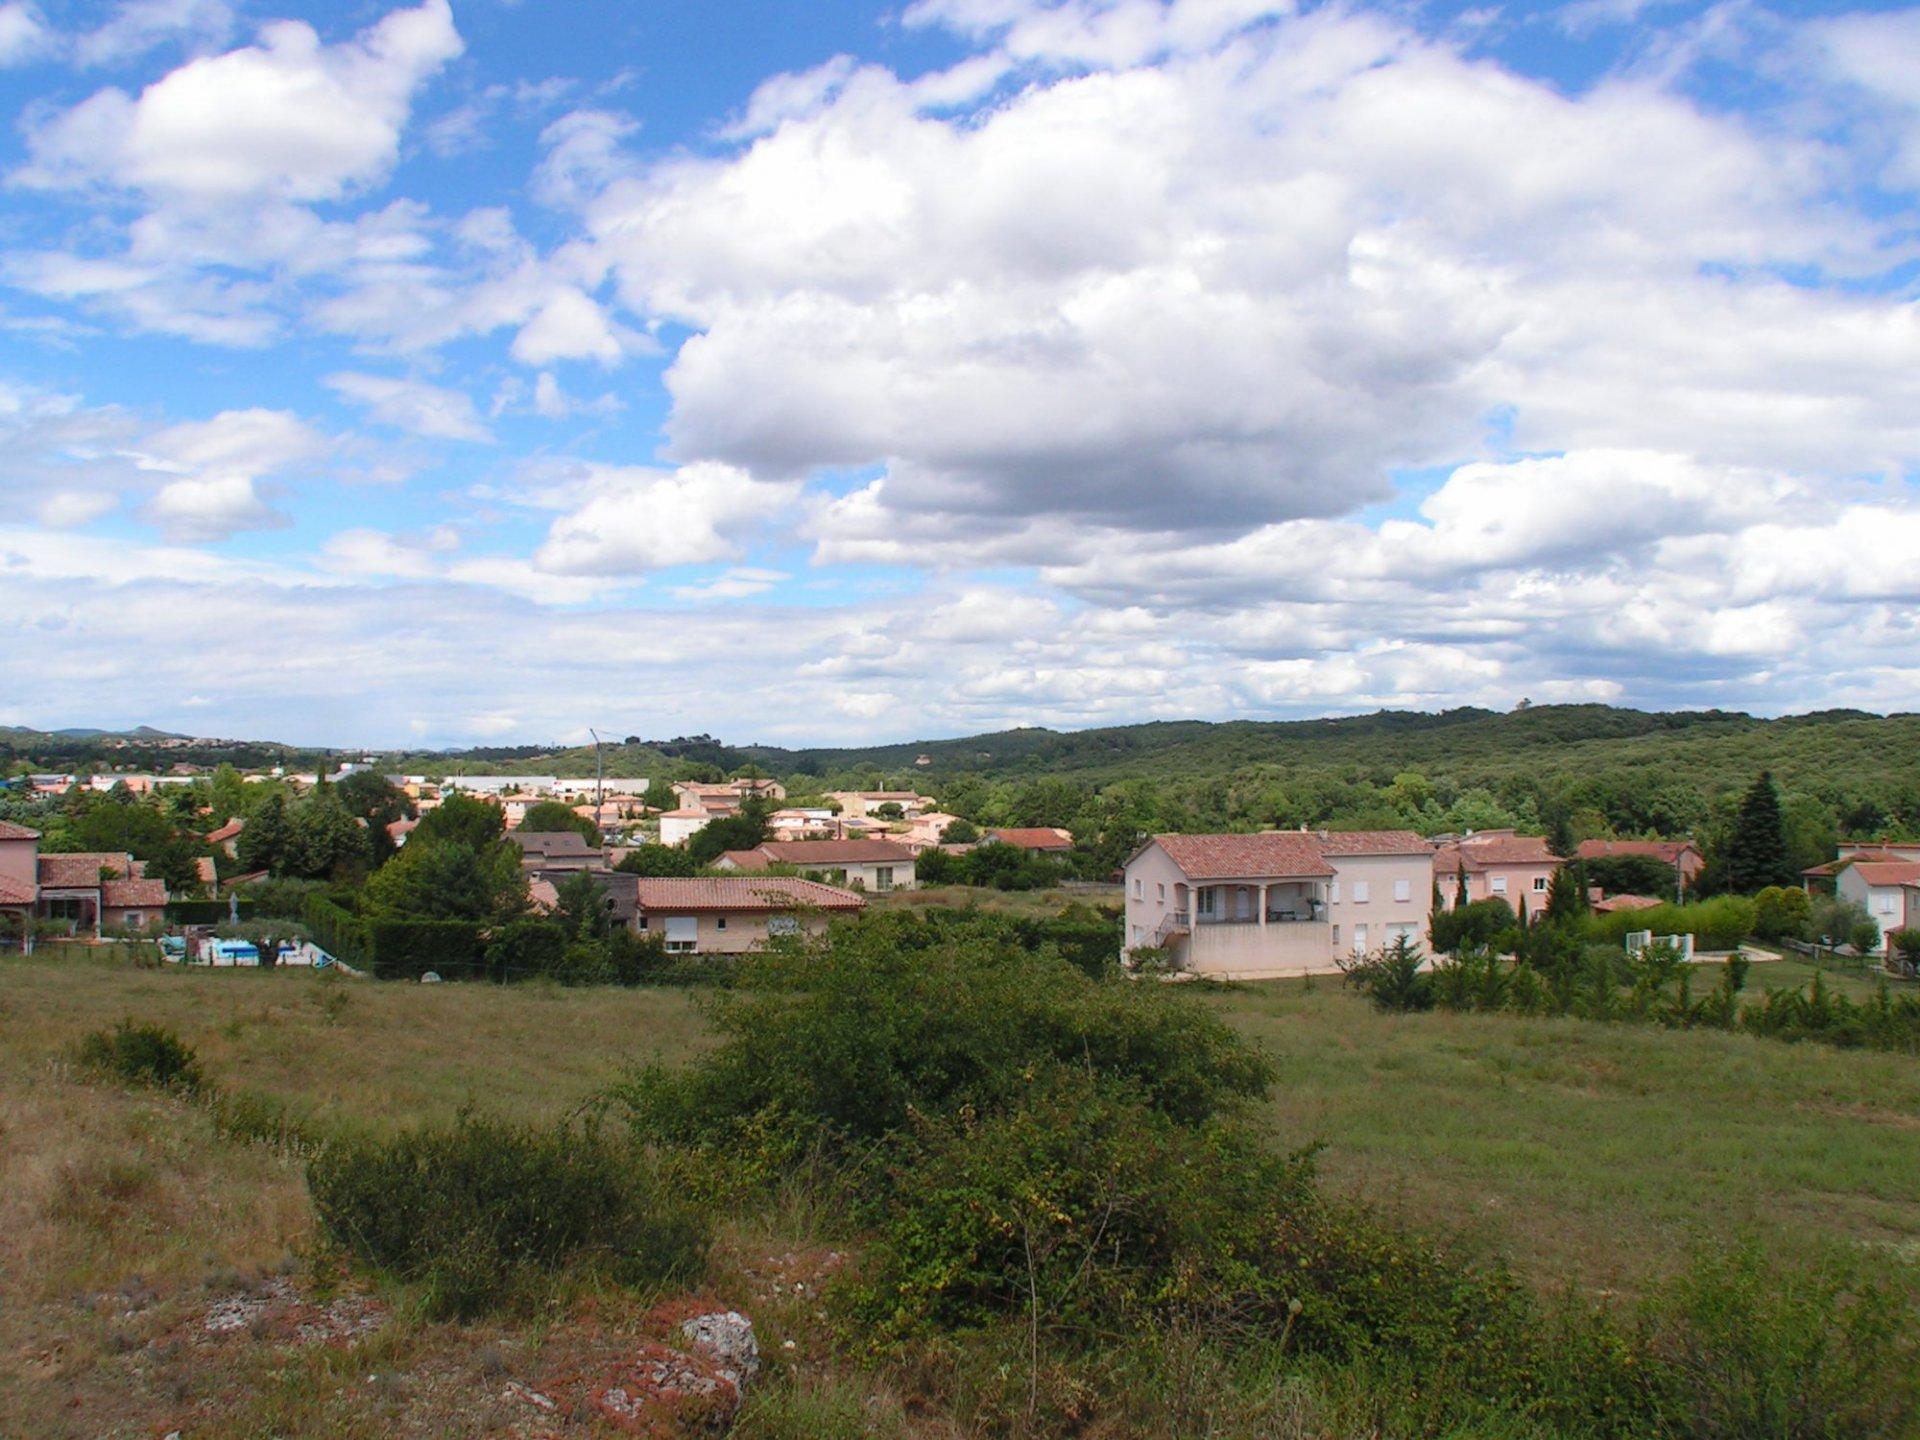 A vendre: Terrain à bâtir 15 villas, Alès, Gard